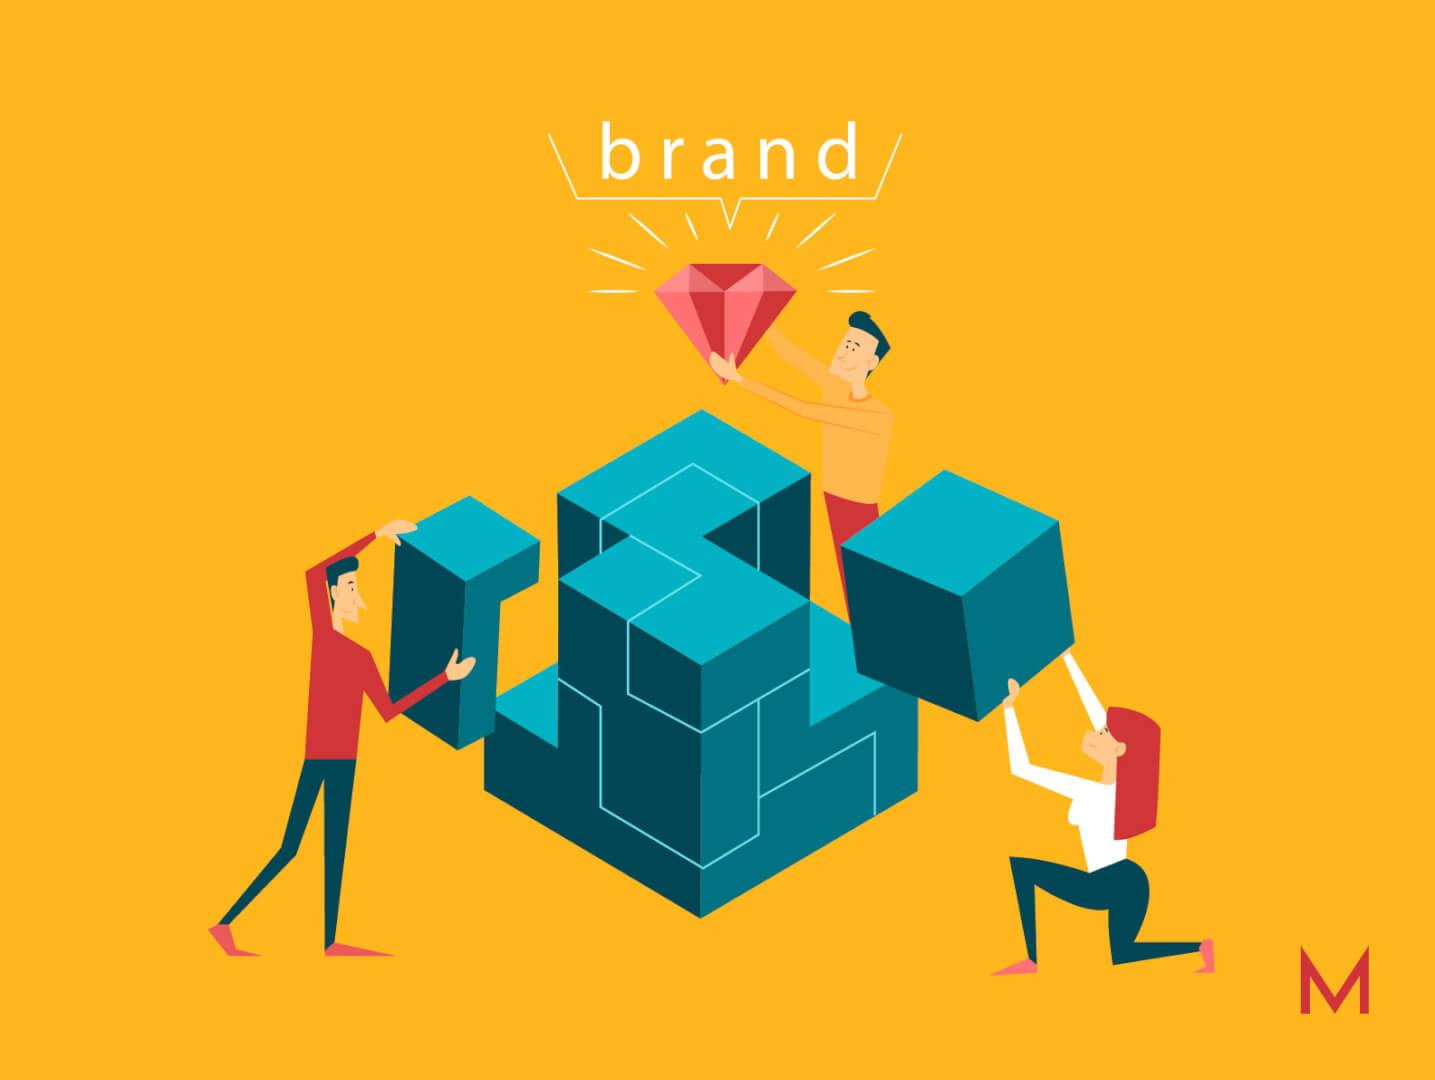 branding 2020